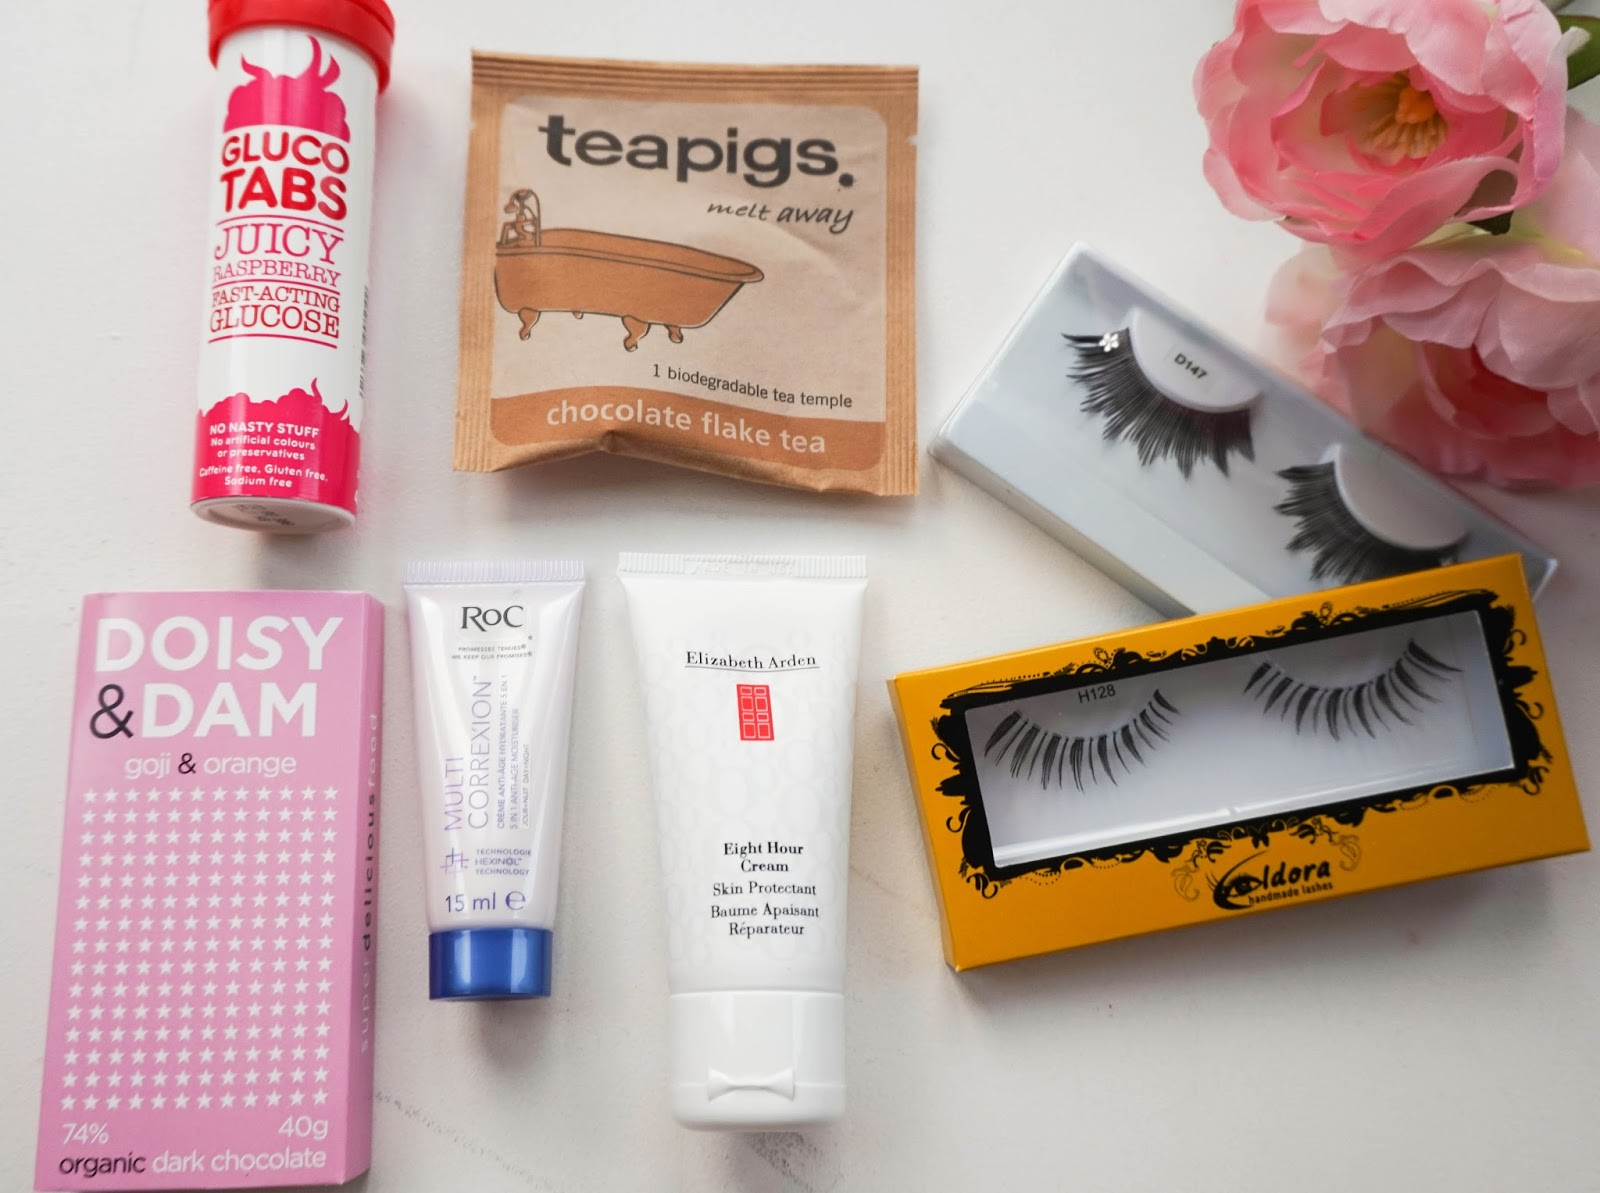 Gluco Tabs, Teapigs, Eldora Lashes, Daisy & Dom, Roc, Elizabeth Arden 8 Hour Cream